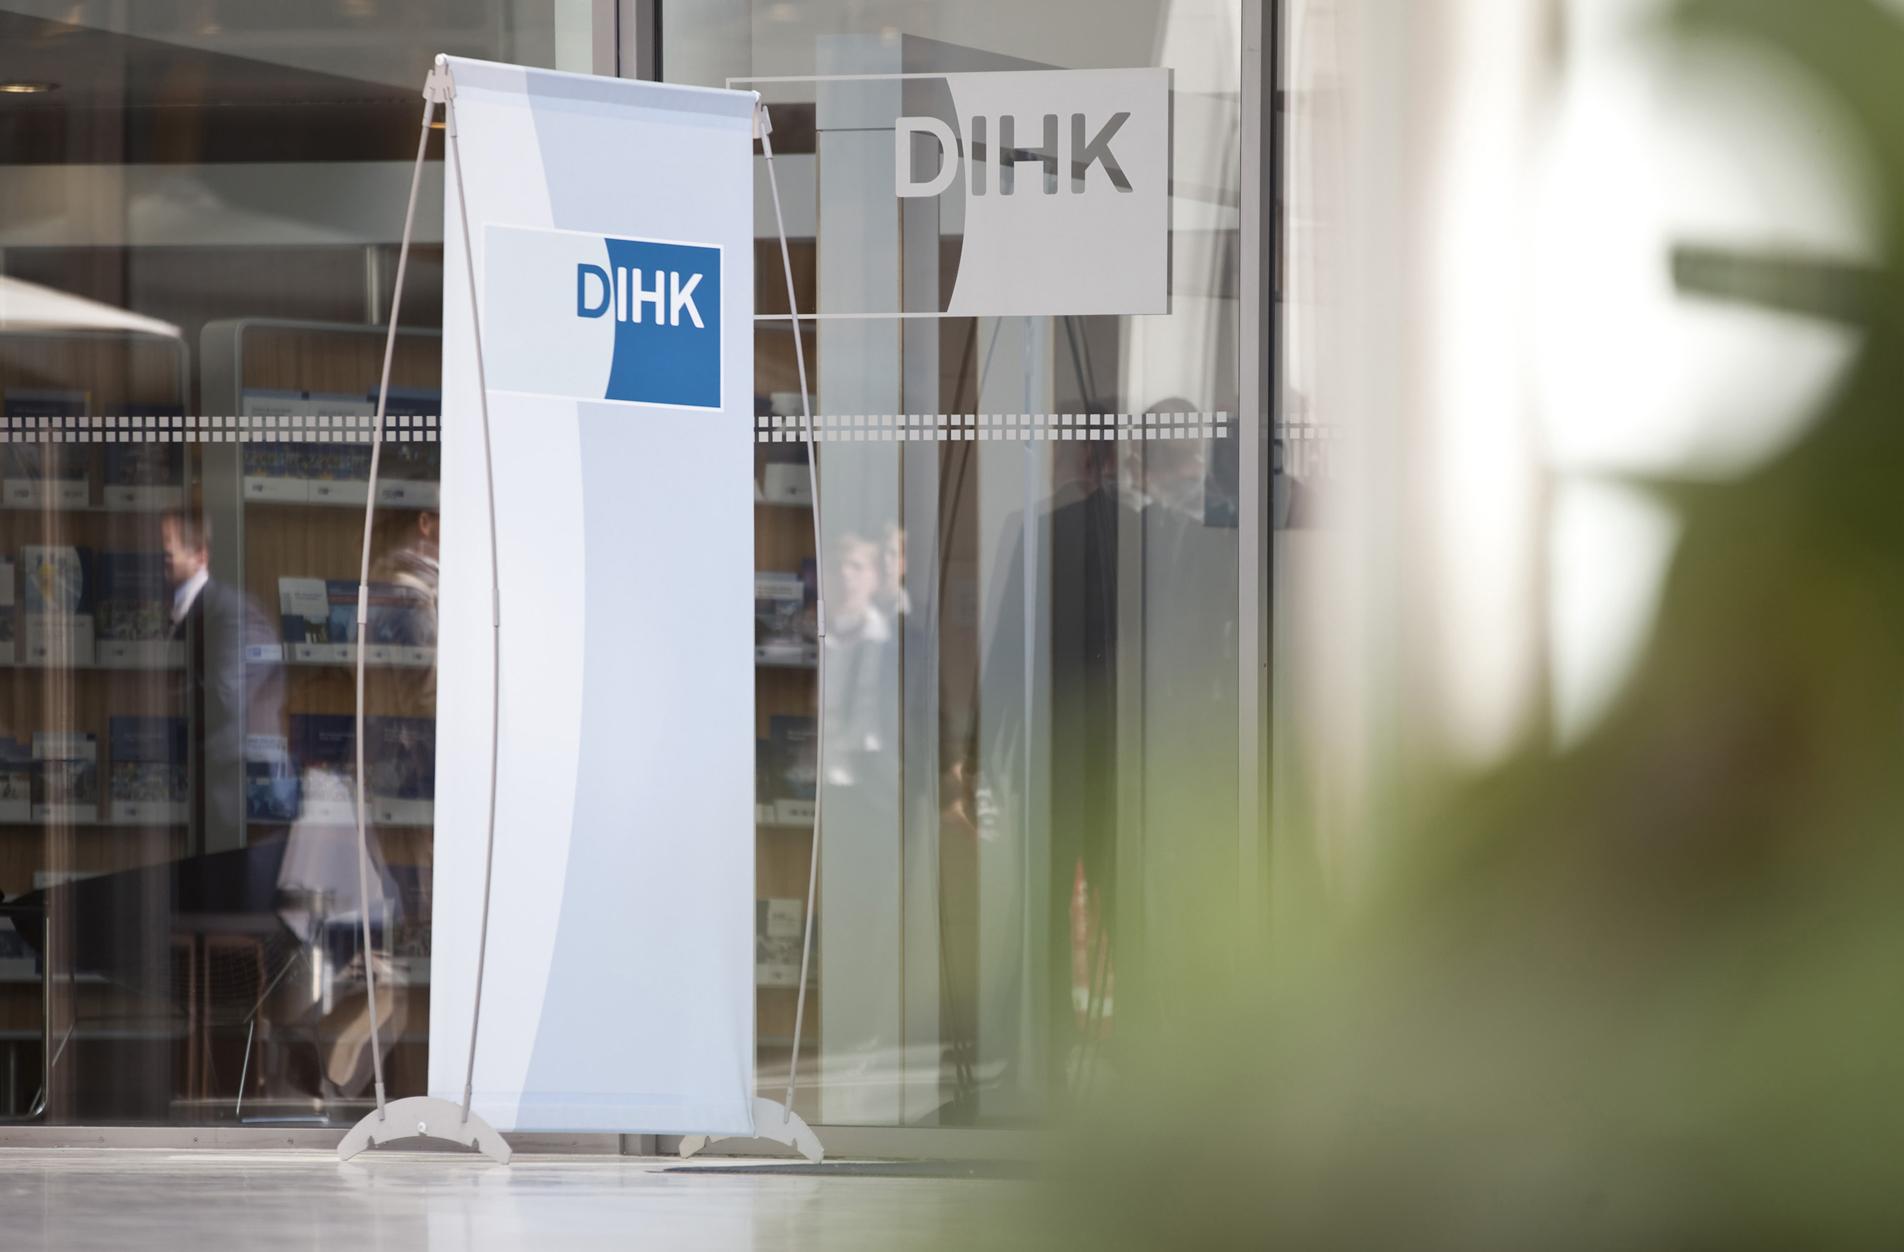 DIHK-Logodisplay